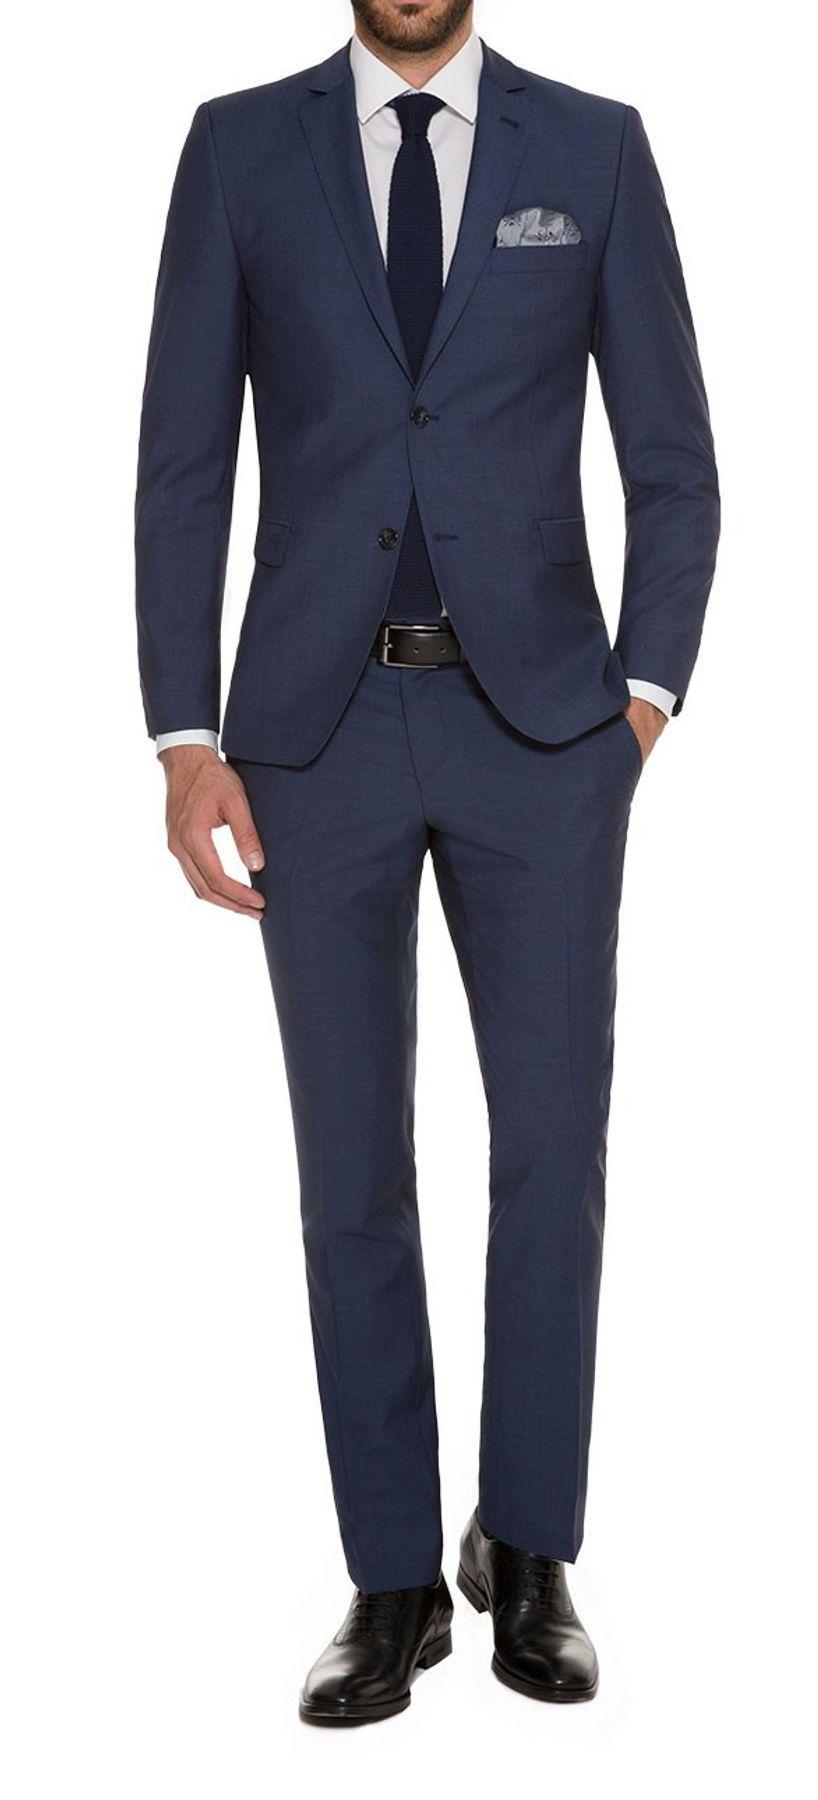 Abiball Anzug - Slim Fit - Herren Anzug in Deep Ocean Blue, Luigi B/Elio (Art.: 835 1510) – Bild 1